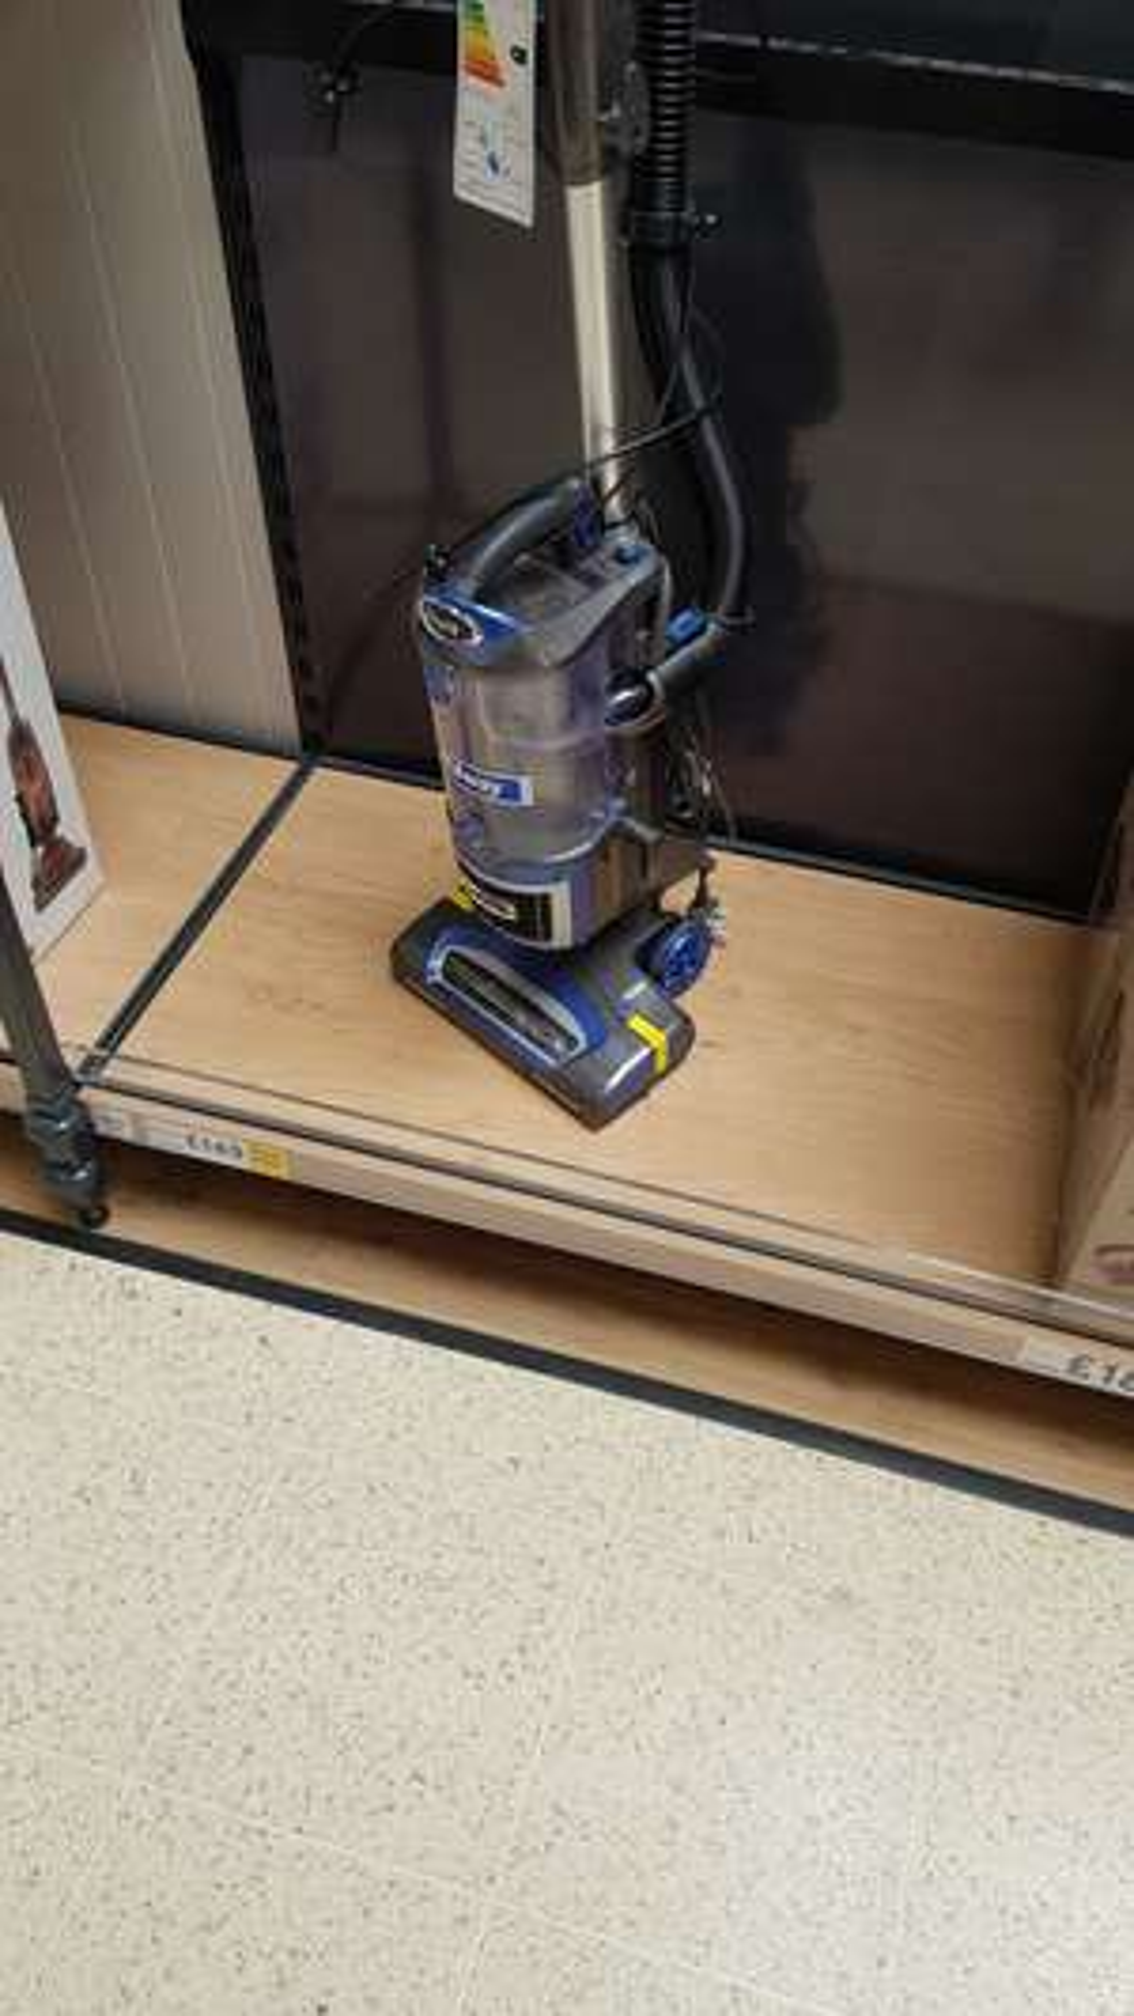 Shark Lift-Away Upright Vacuum Cleaner NV601UK  Vacuum - £149 @ Tesco (Stretford)